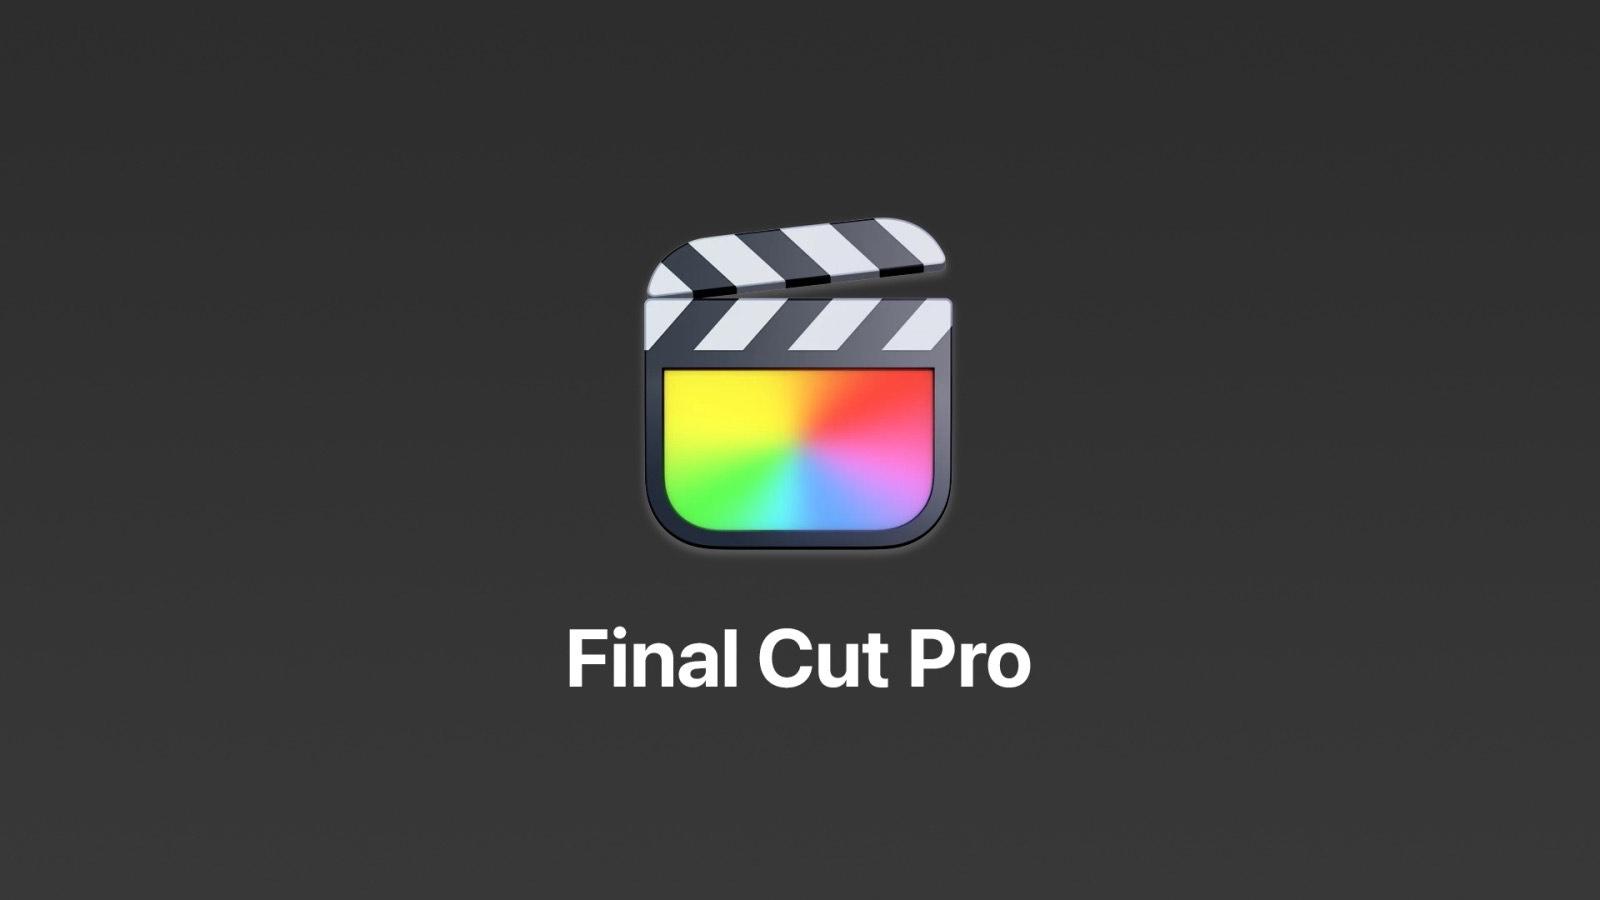 Apple 最新Final Cut Pro,iMovie,Motion和Compressor for Mac的更新